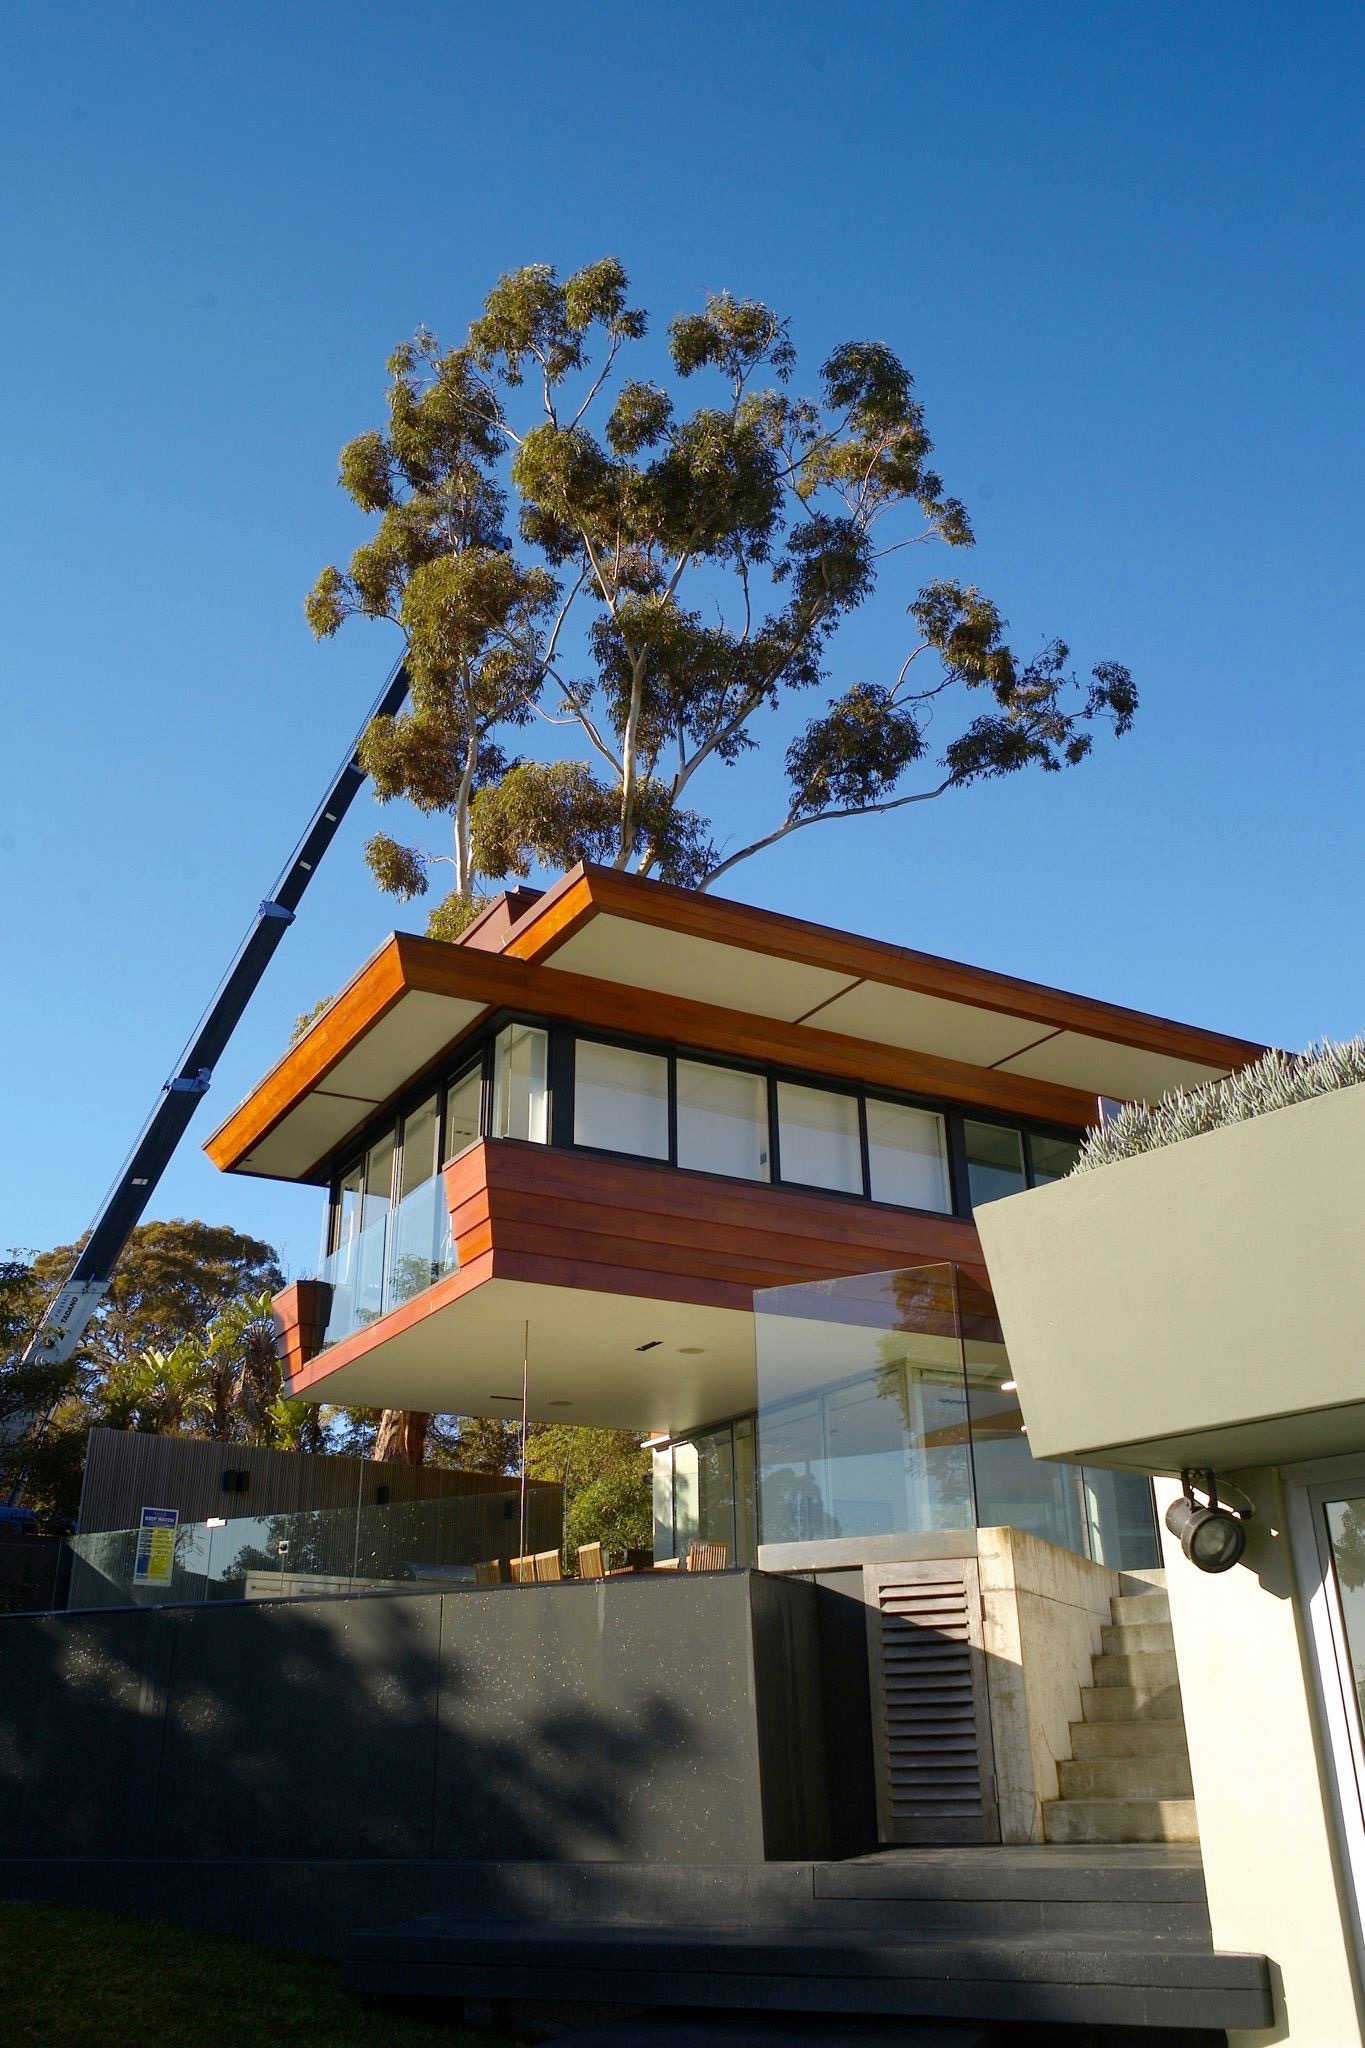 Crane Access